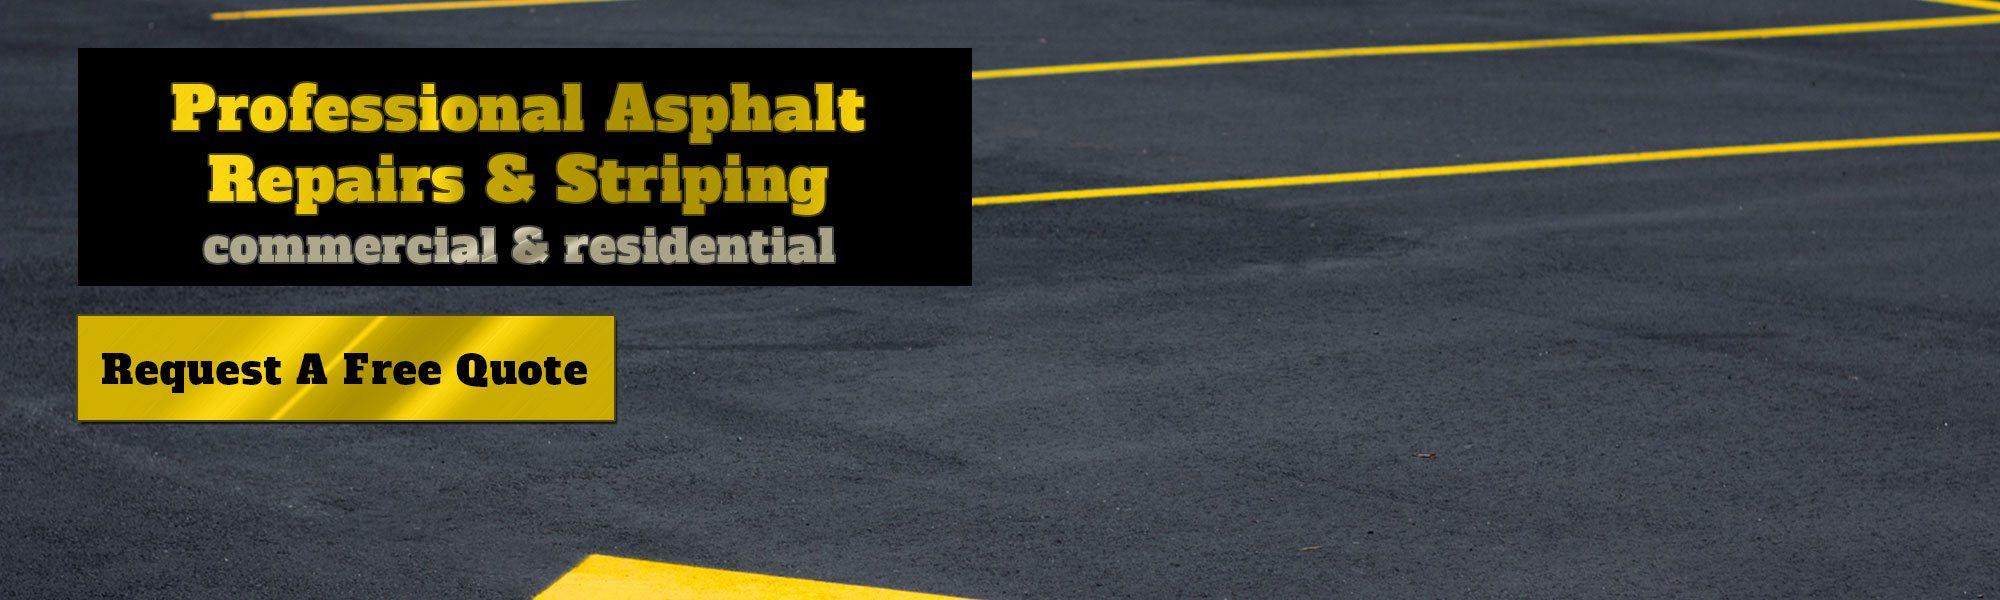 commercial asphalt contractor kansas city mo